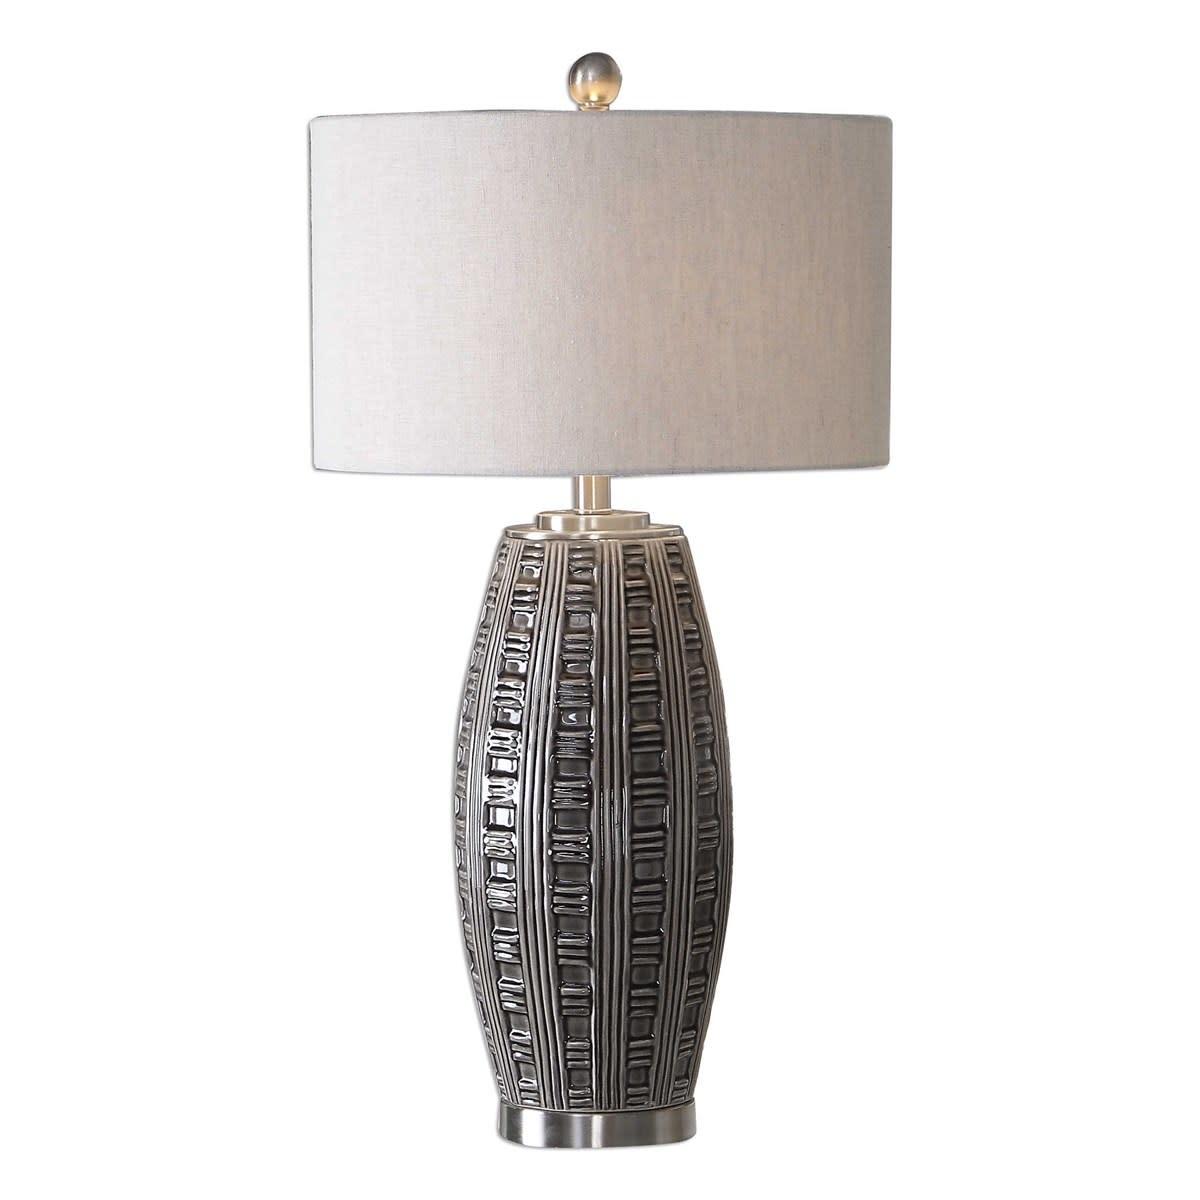 Uttermost Gray Glaze Table Lamp